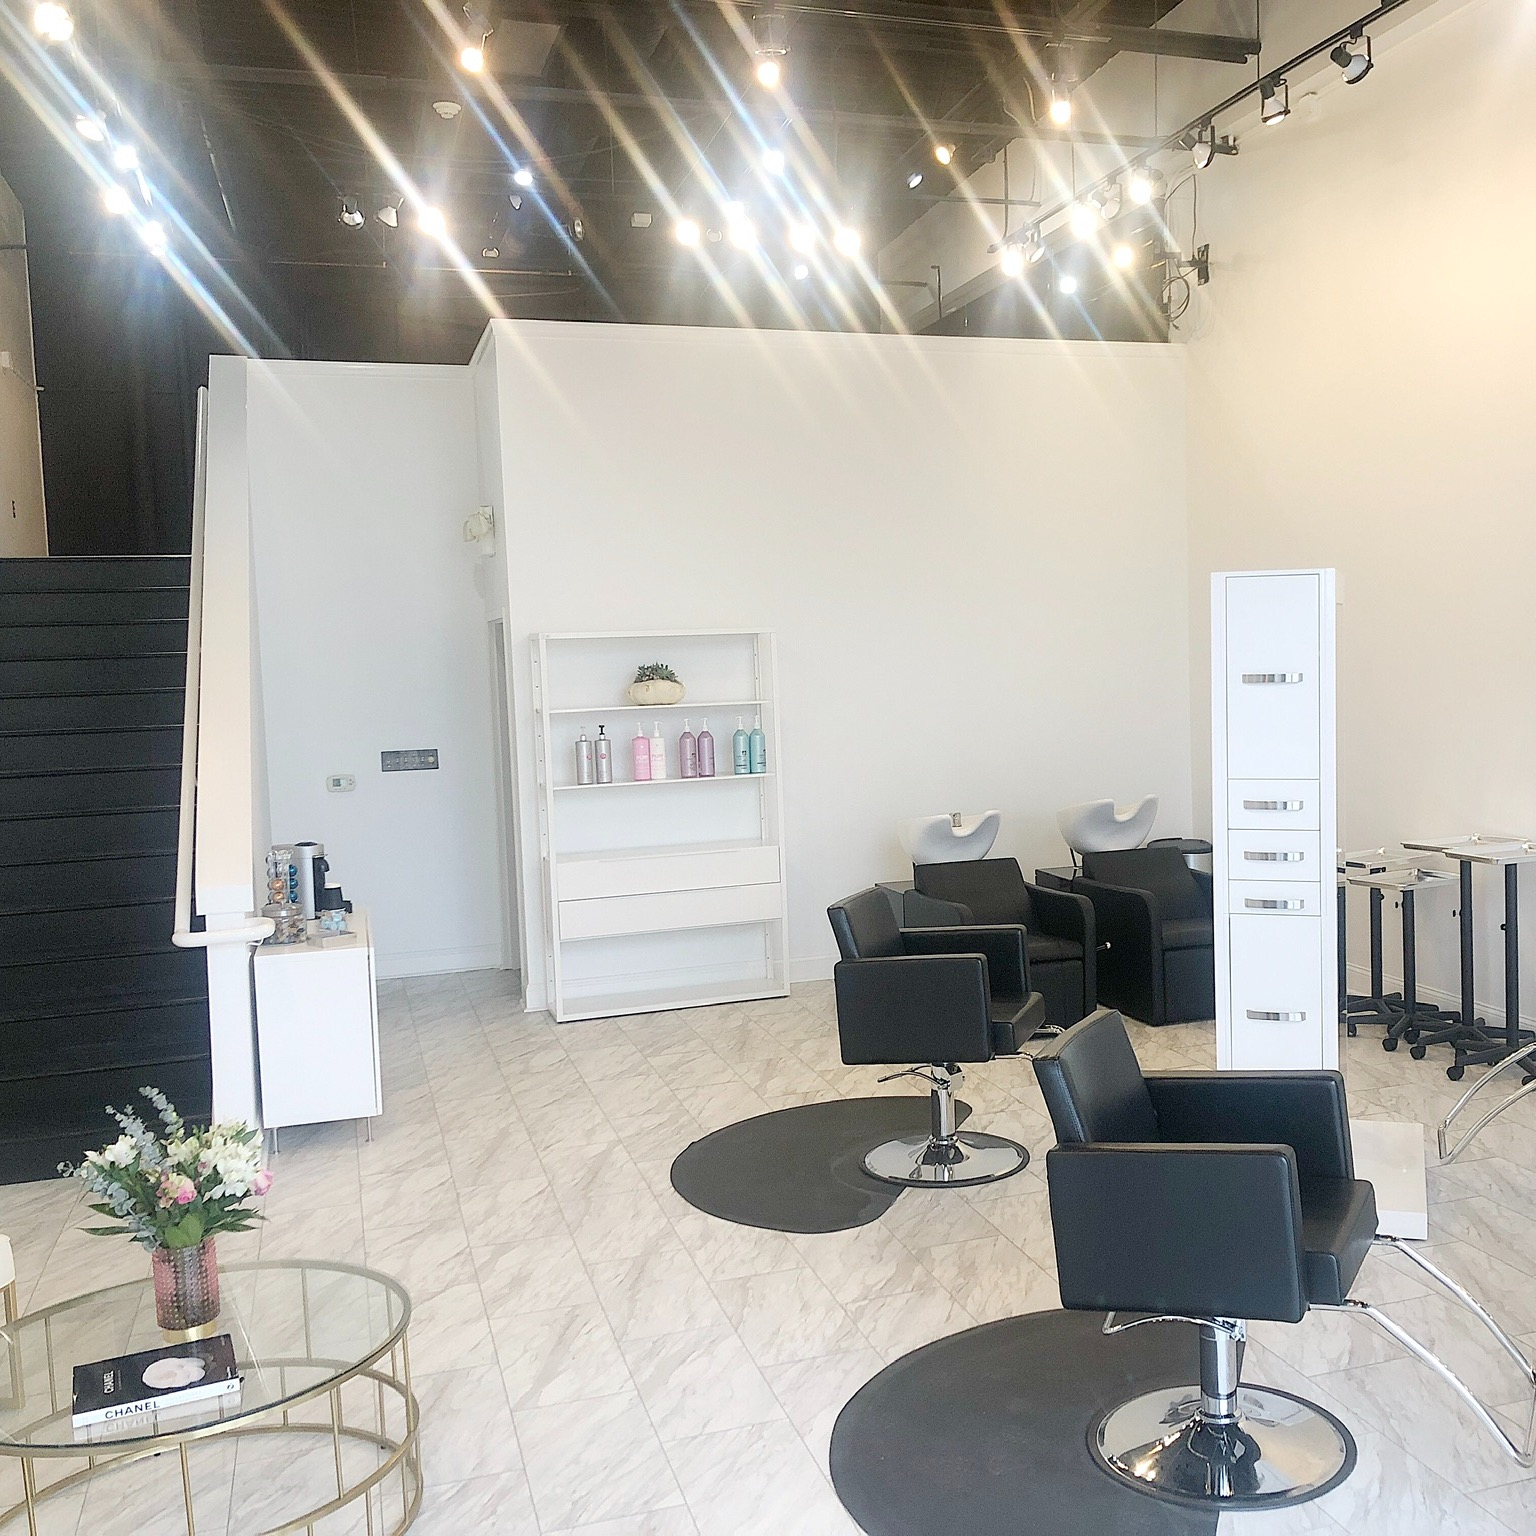 Hairstylist   HairFluencer My Salon Website Link Thumbnail   Linktree